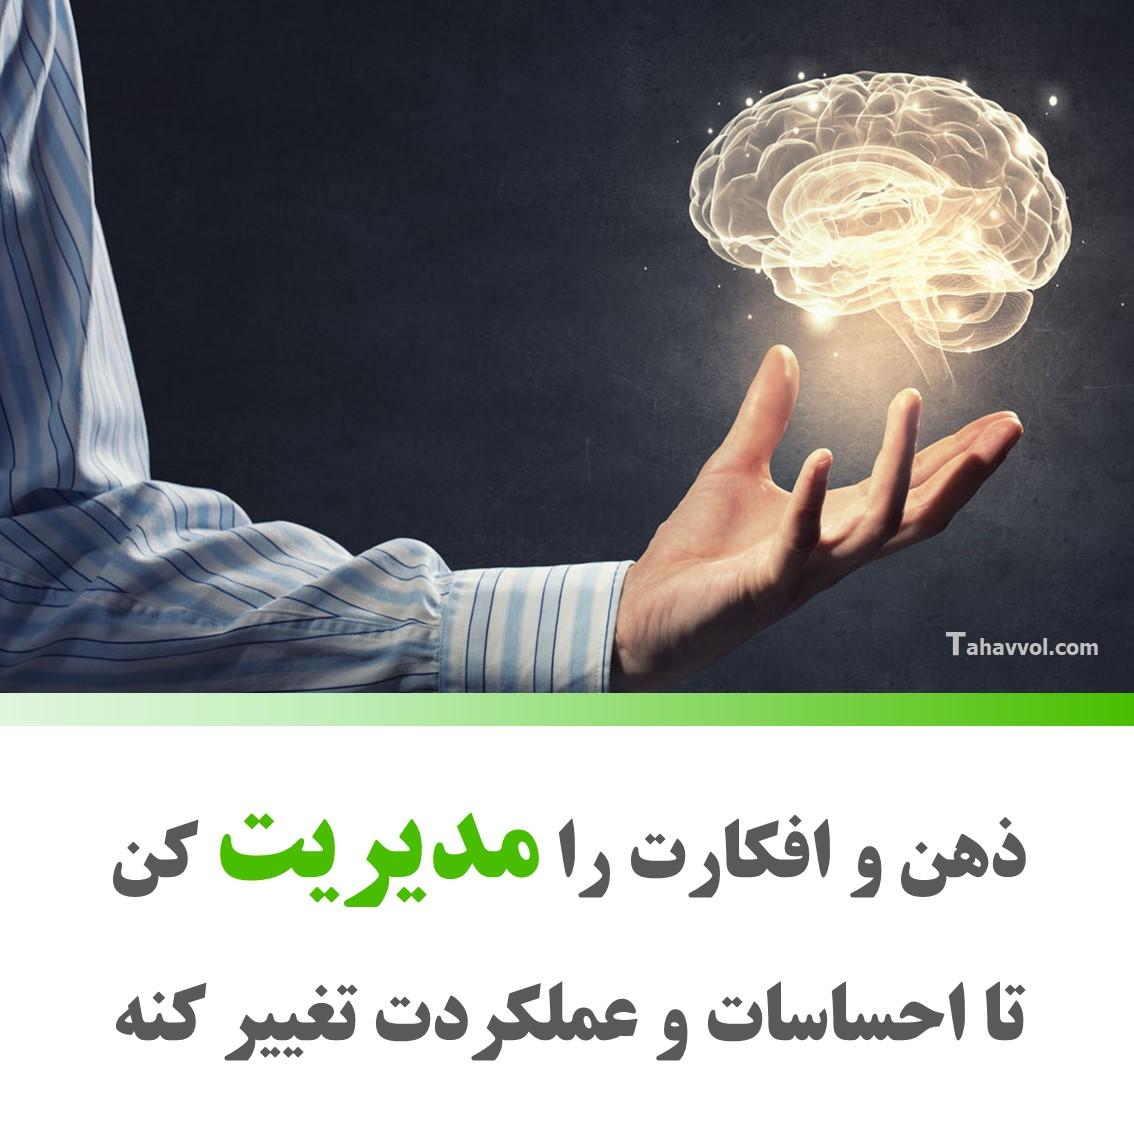 قدرت فکر